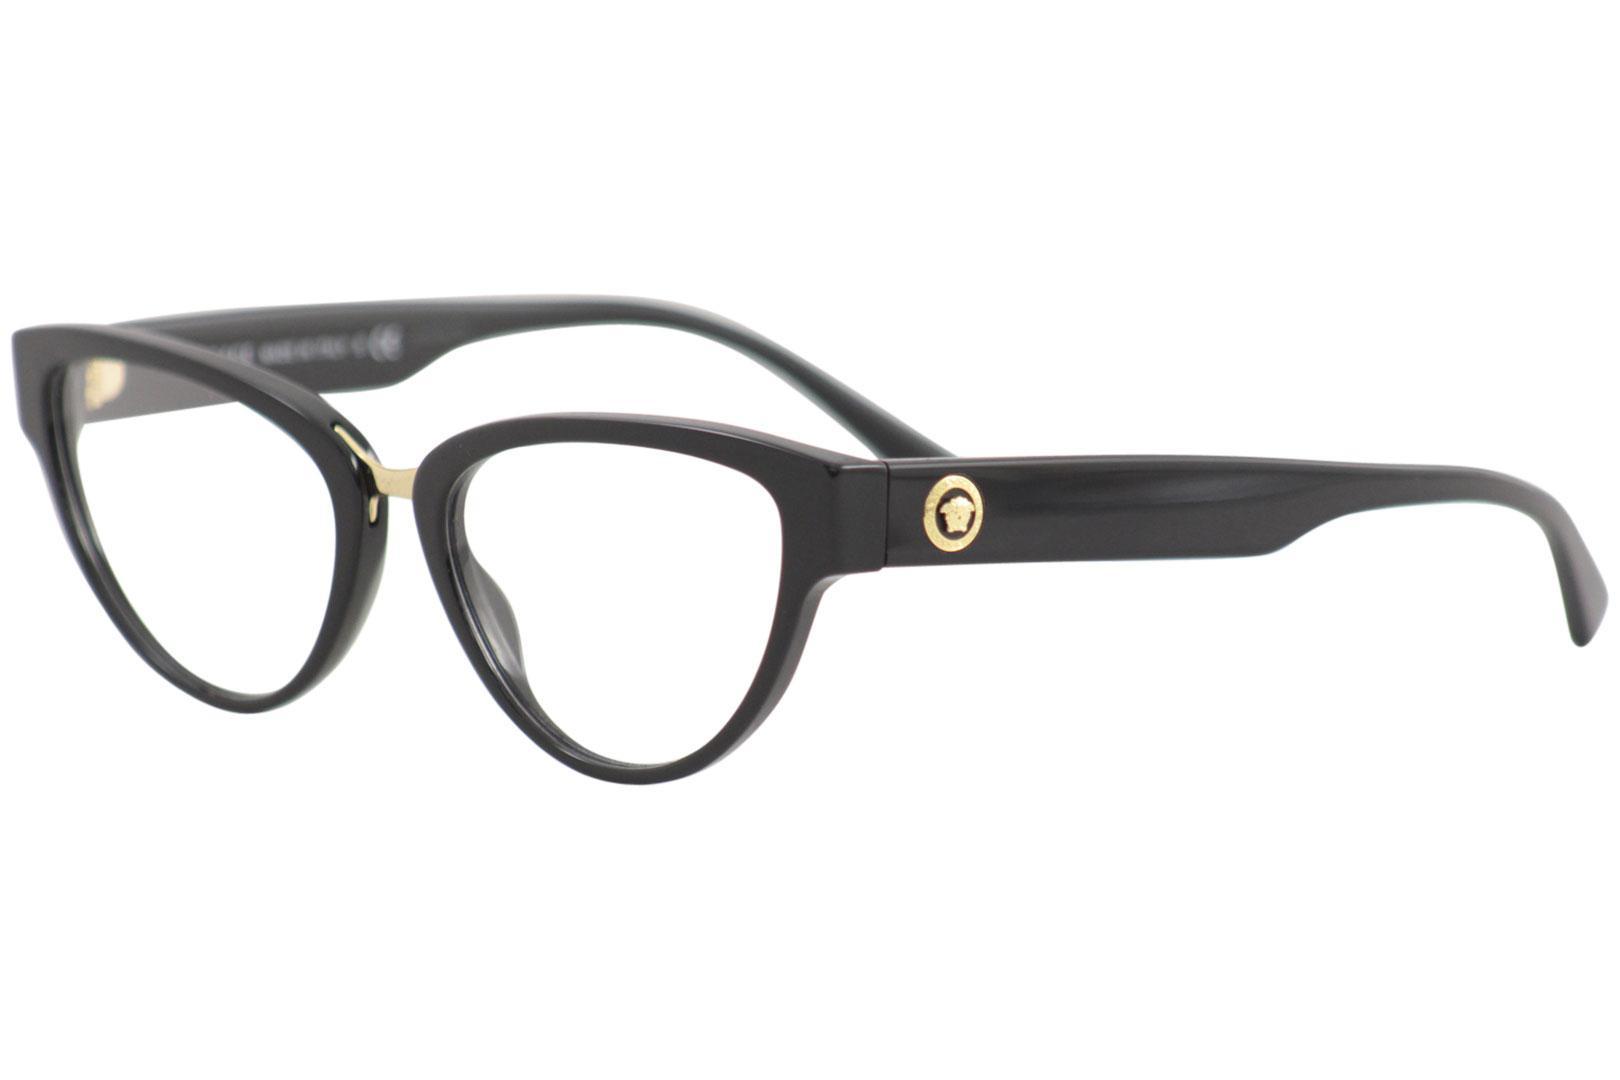 Black VE3267-GB1-51 Versace VE3267 Eyeglass Frames GB1-51